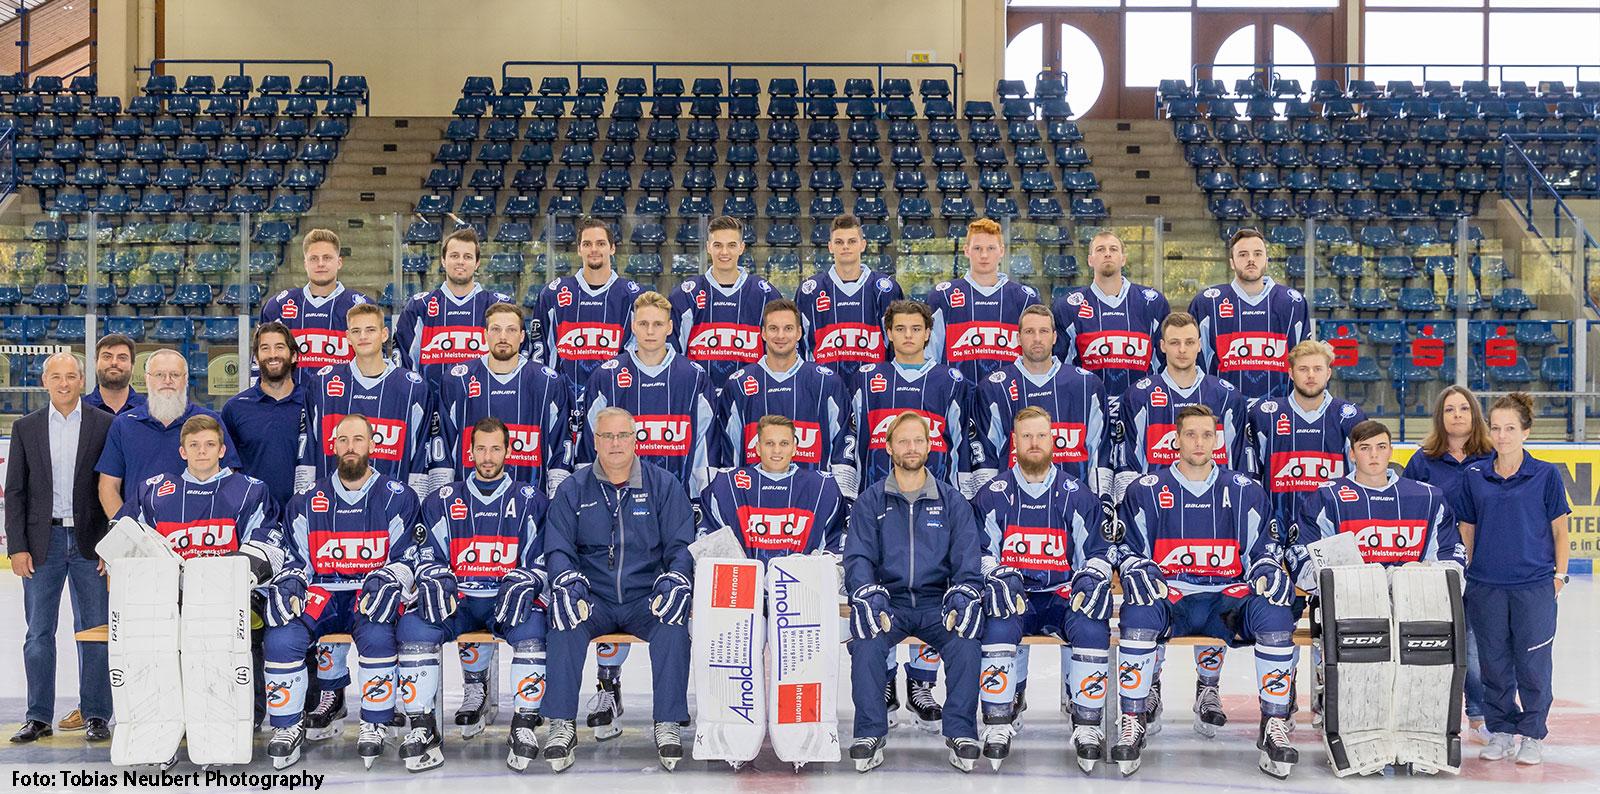 Teamfoto Blue Devils